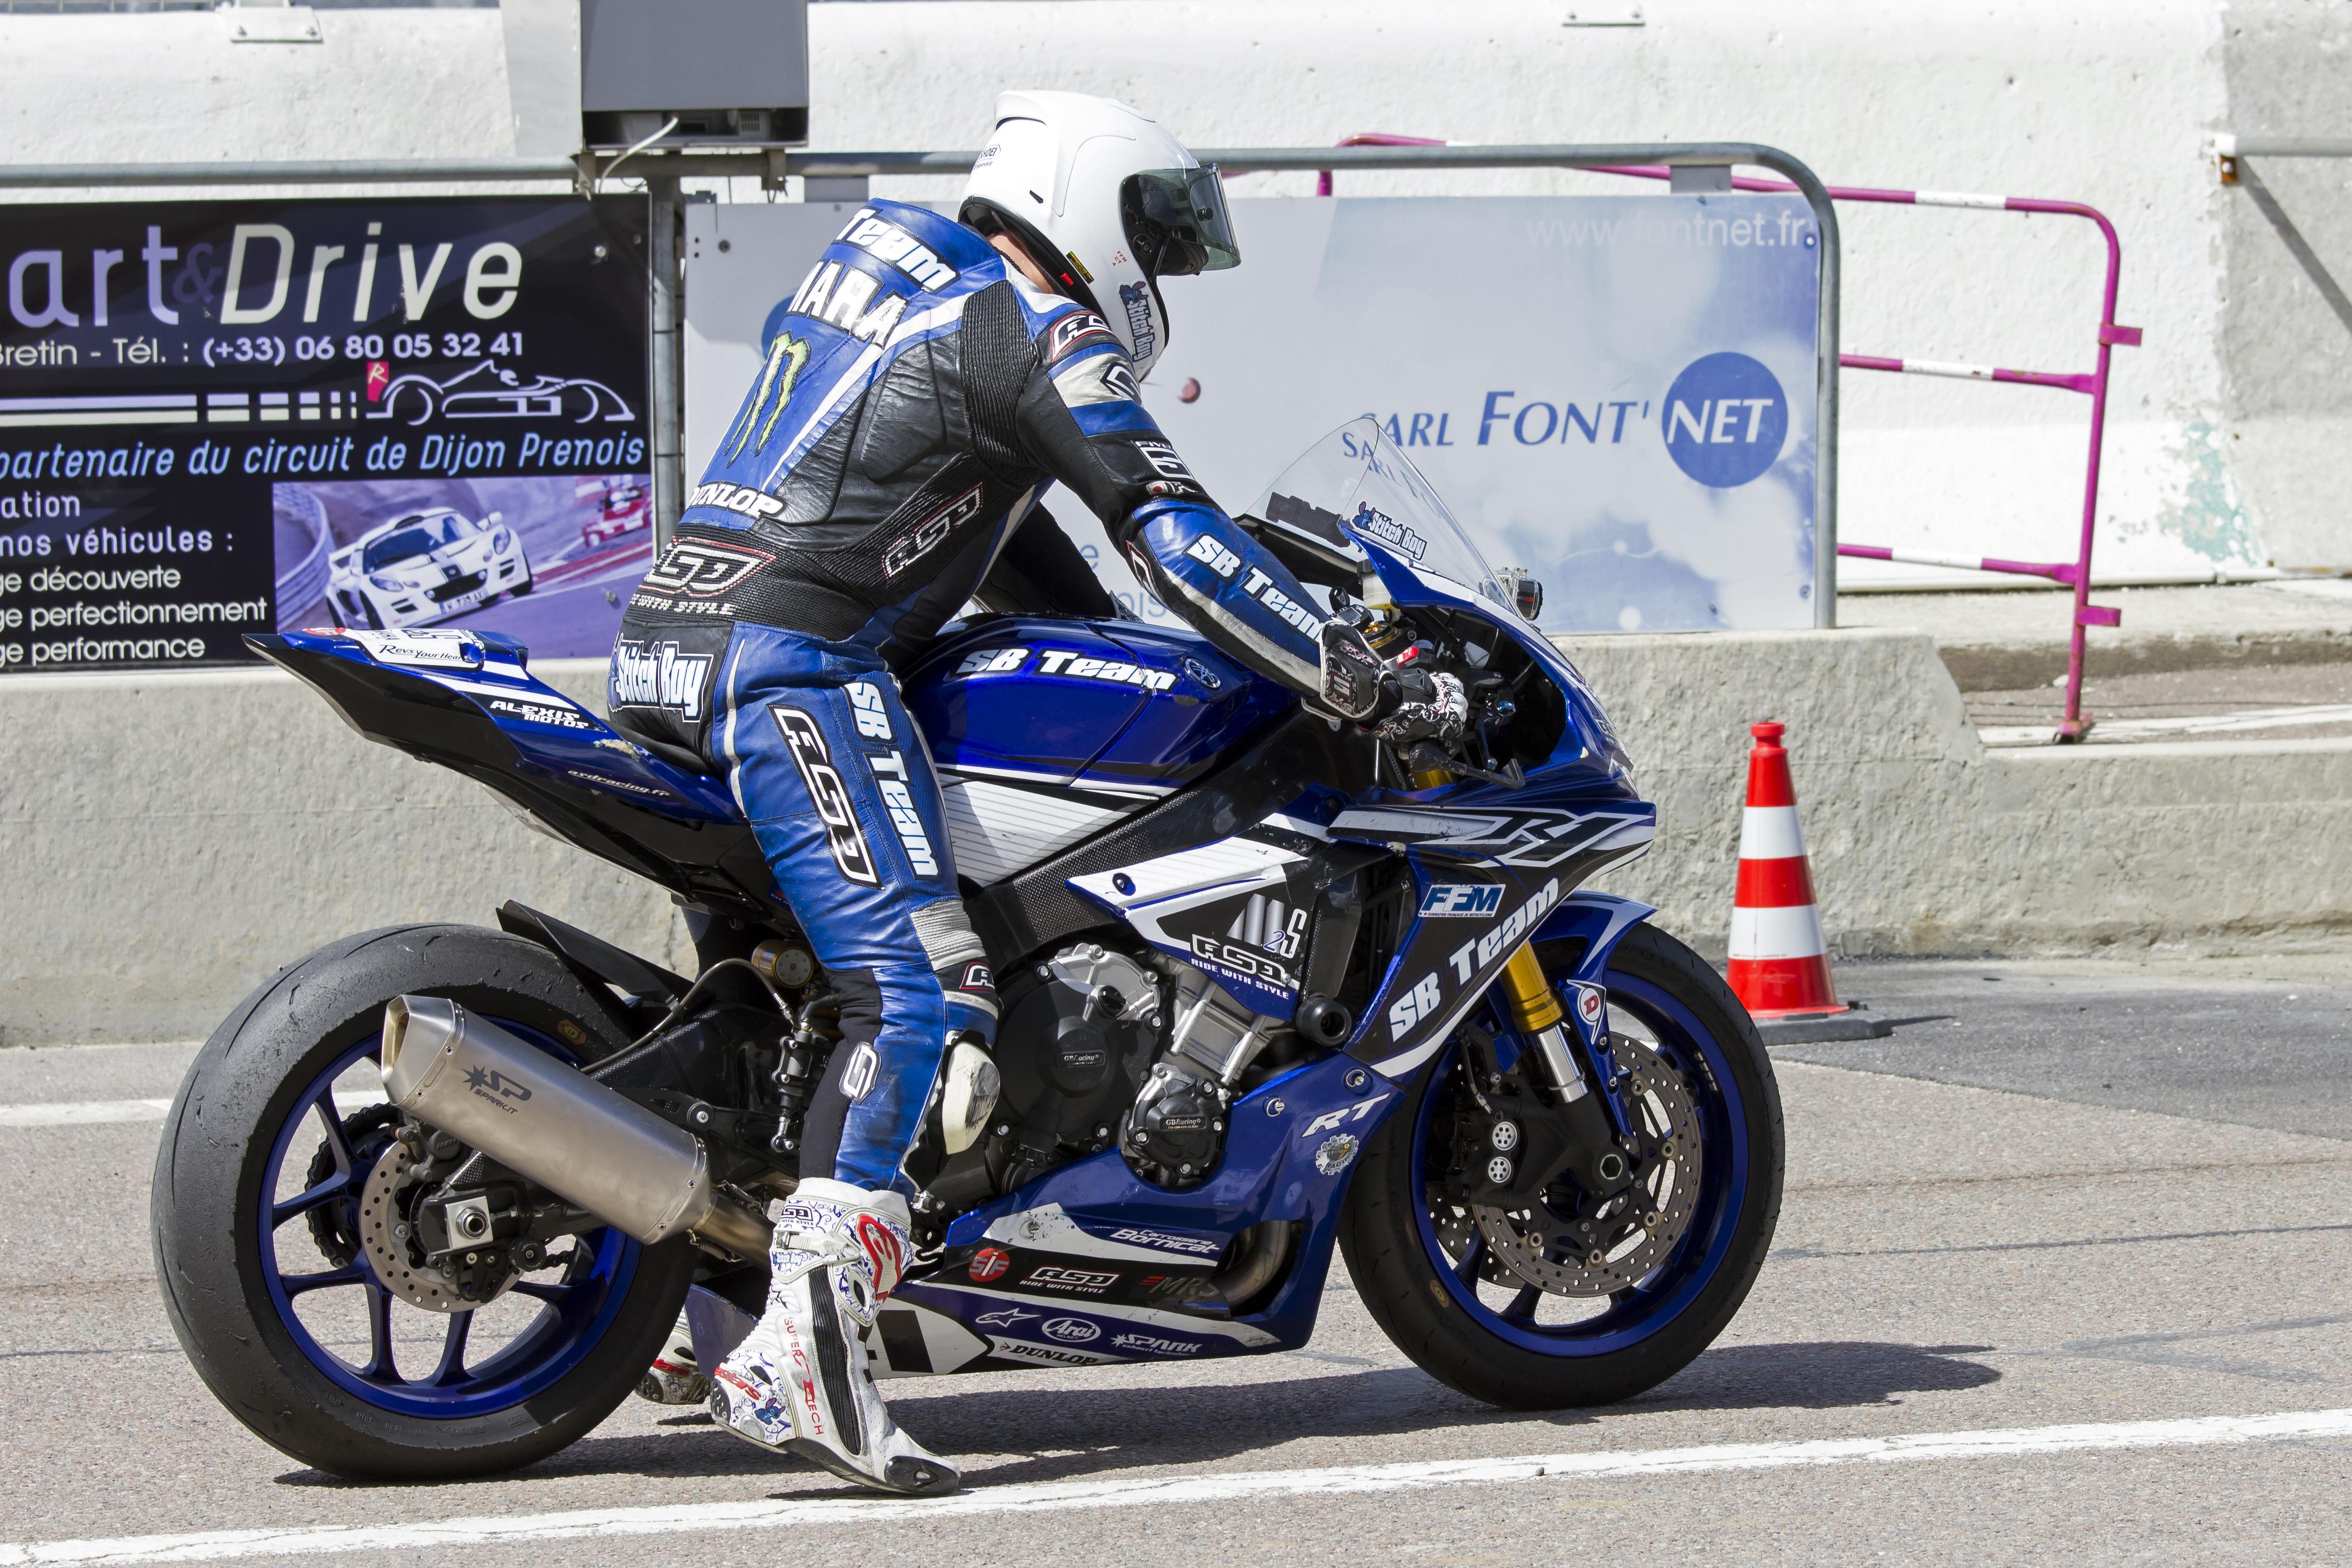 Yamaha R1 et R1M  Crossplane 2015 ( sujet numero3 ) - Page 5 405773IMG0558dev2016